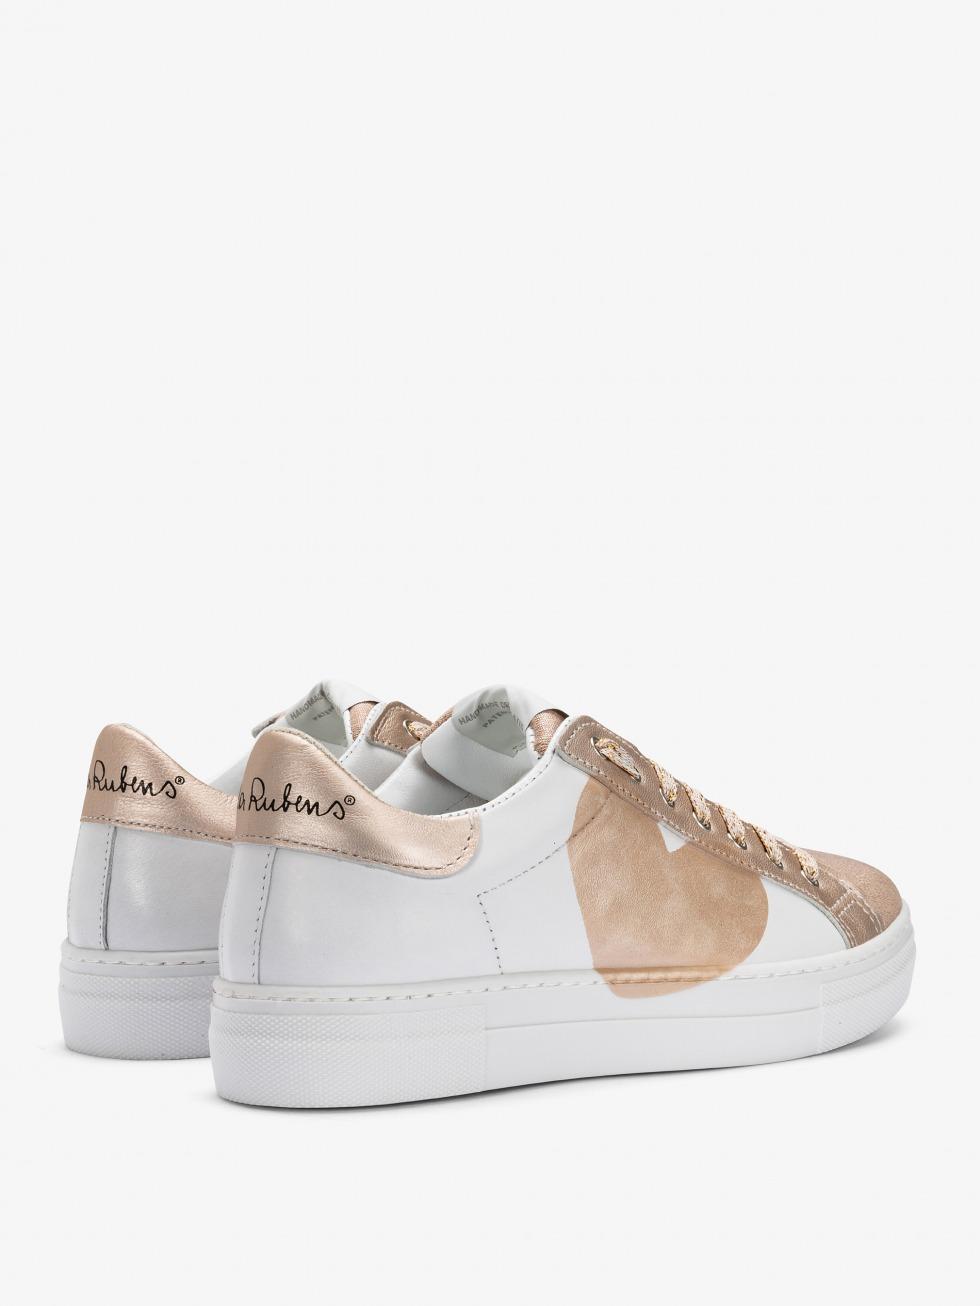 Sneakers Martini Luxury Avorio - Cuore